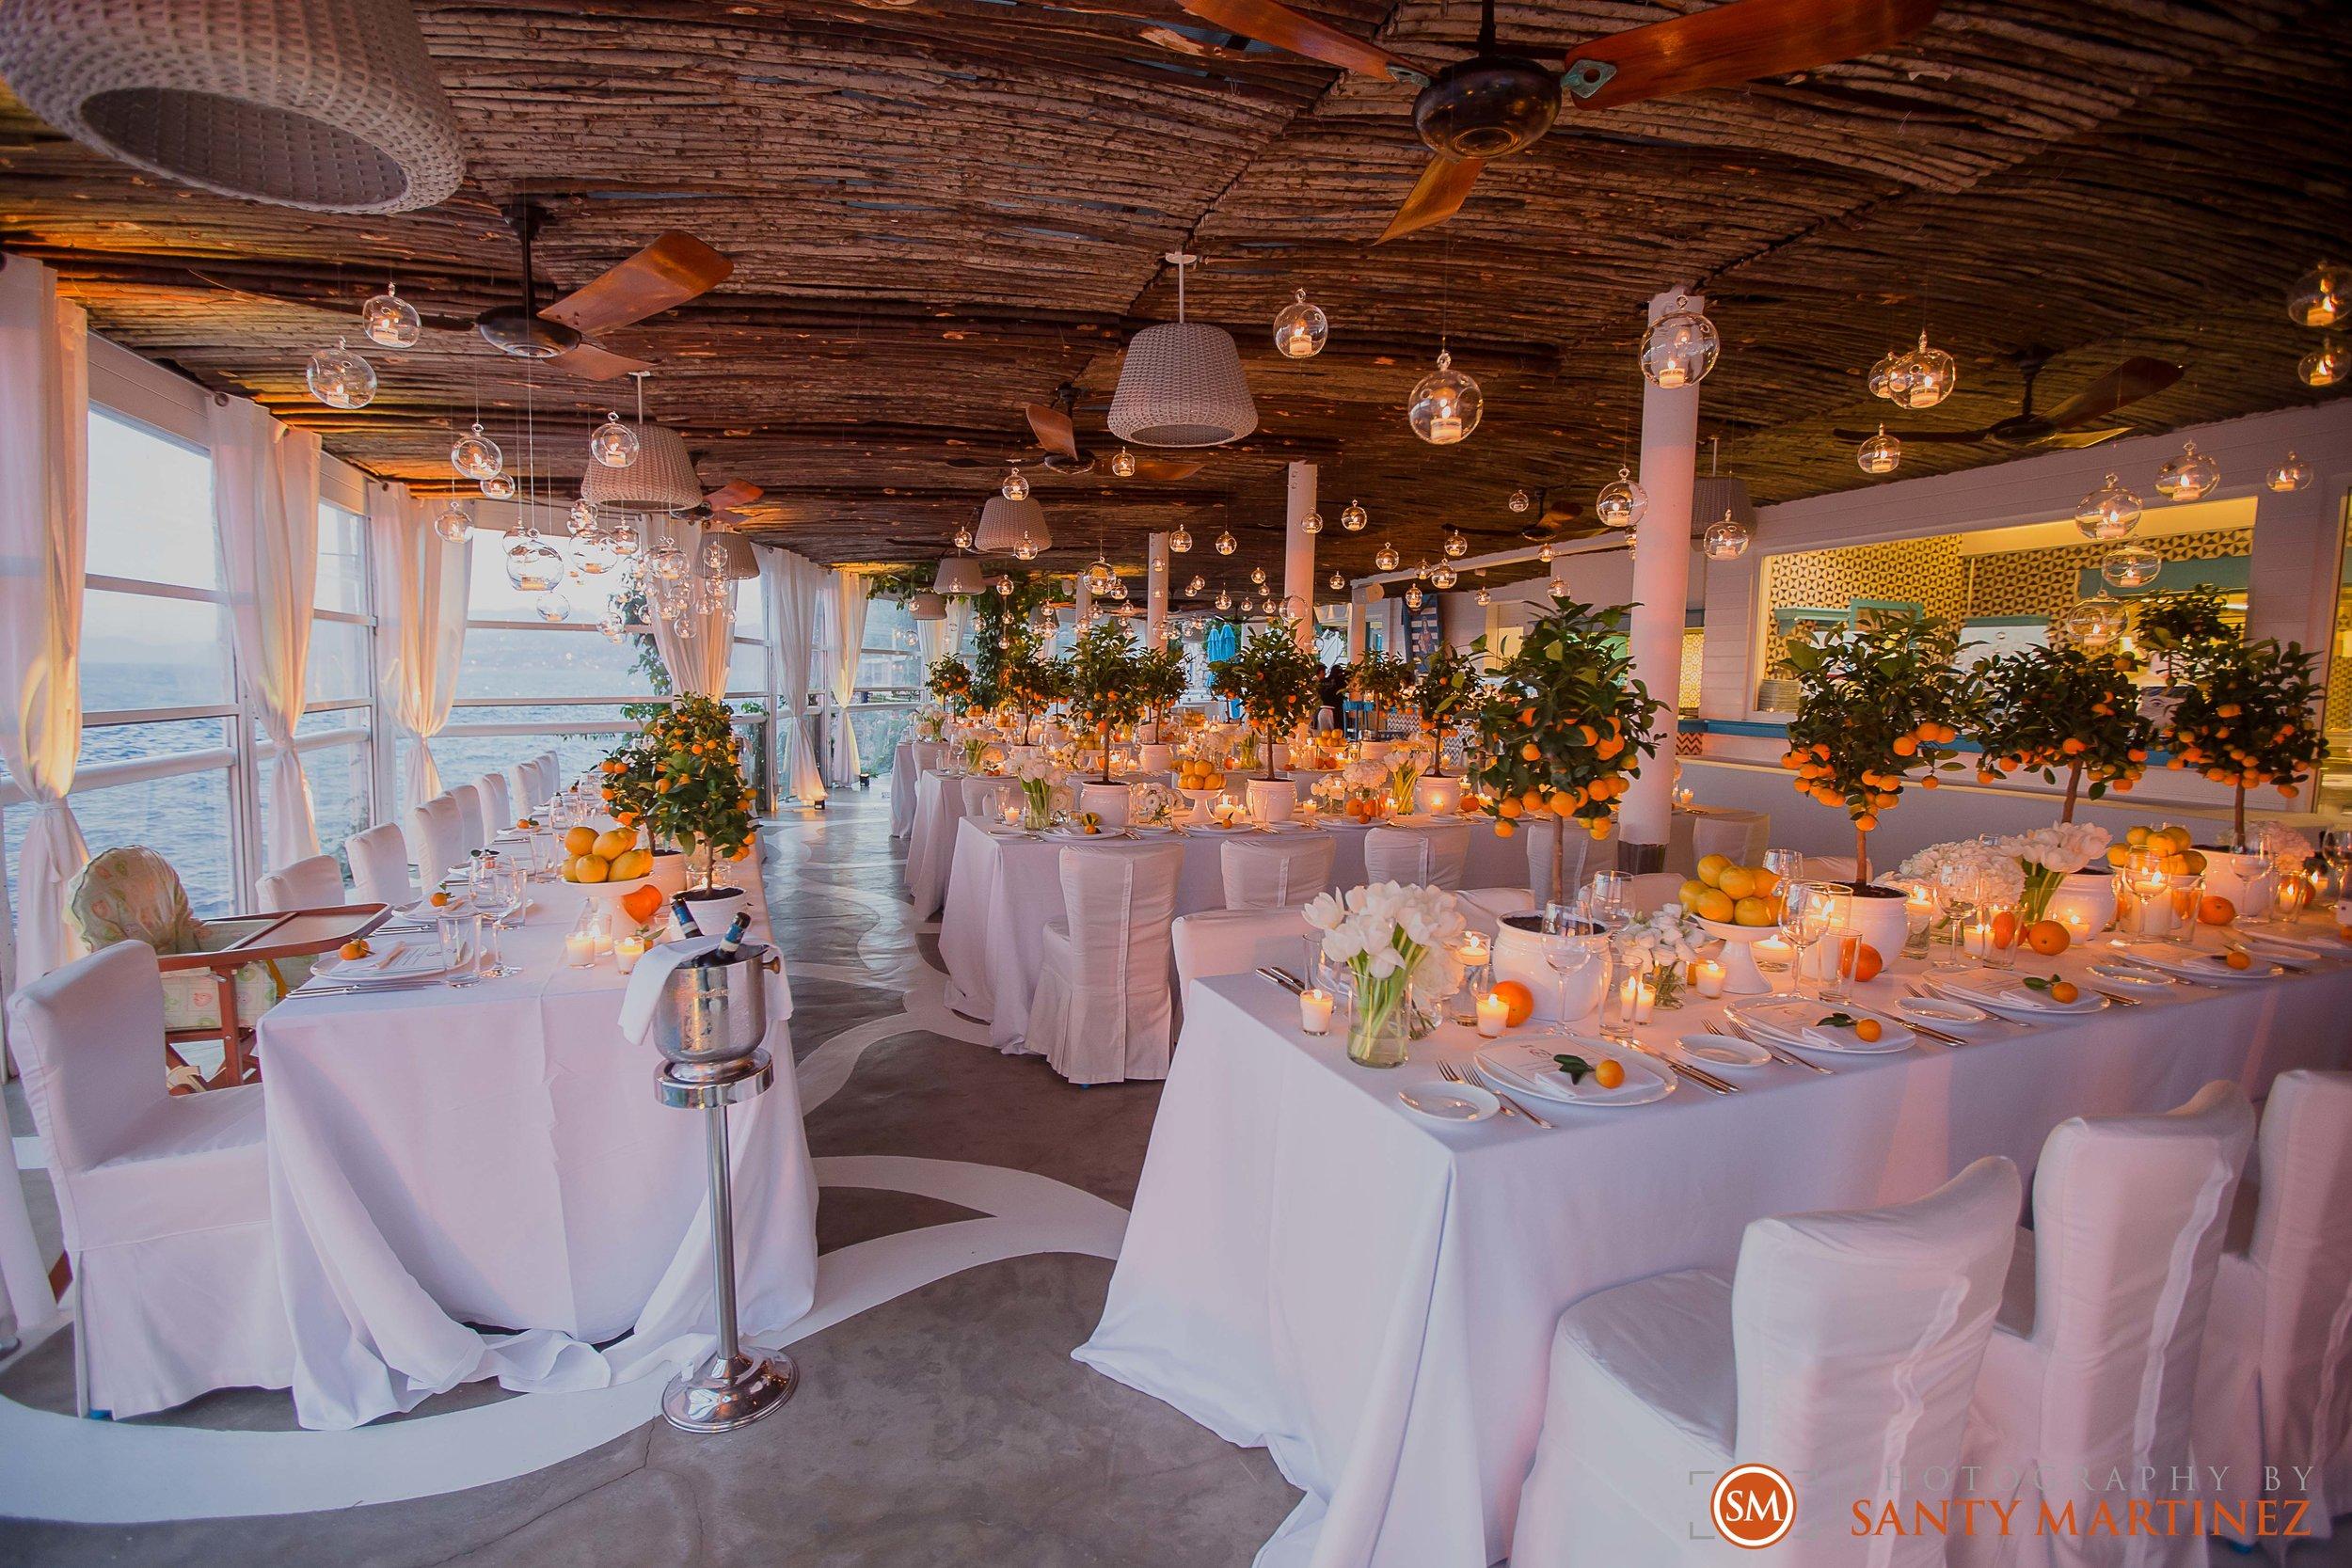 Wedding Capri Italy - Photography by Santy Martinez-63.jpg